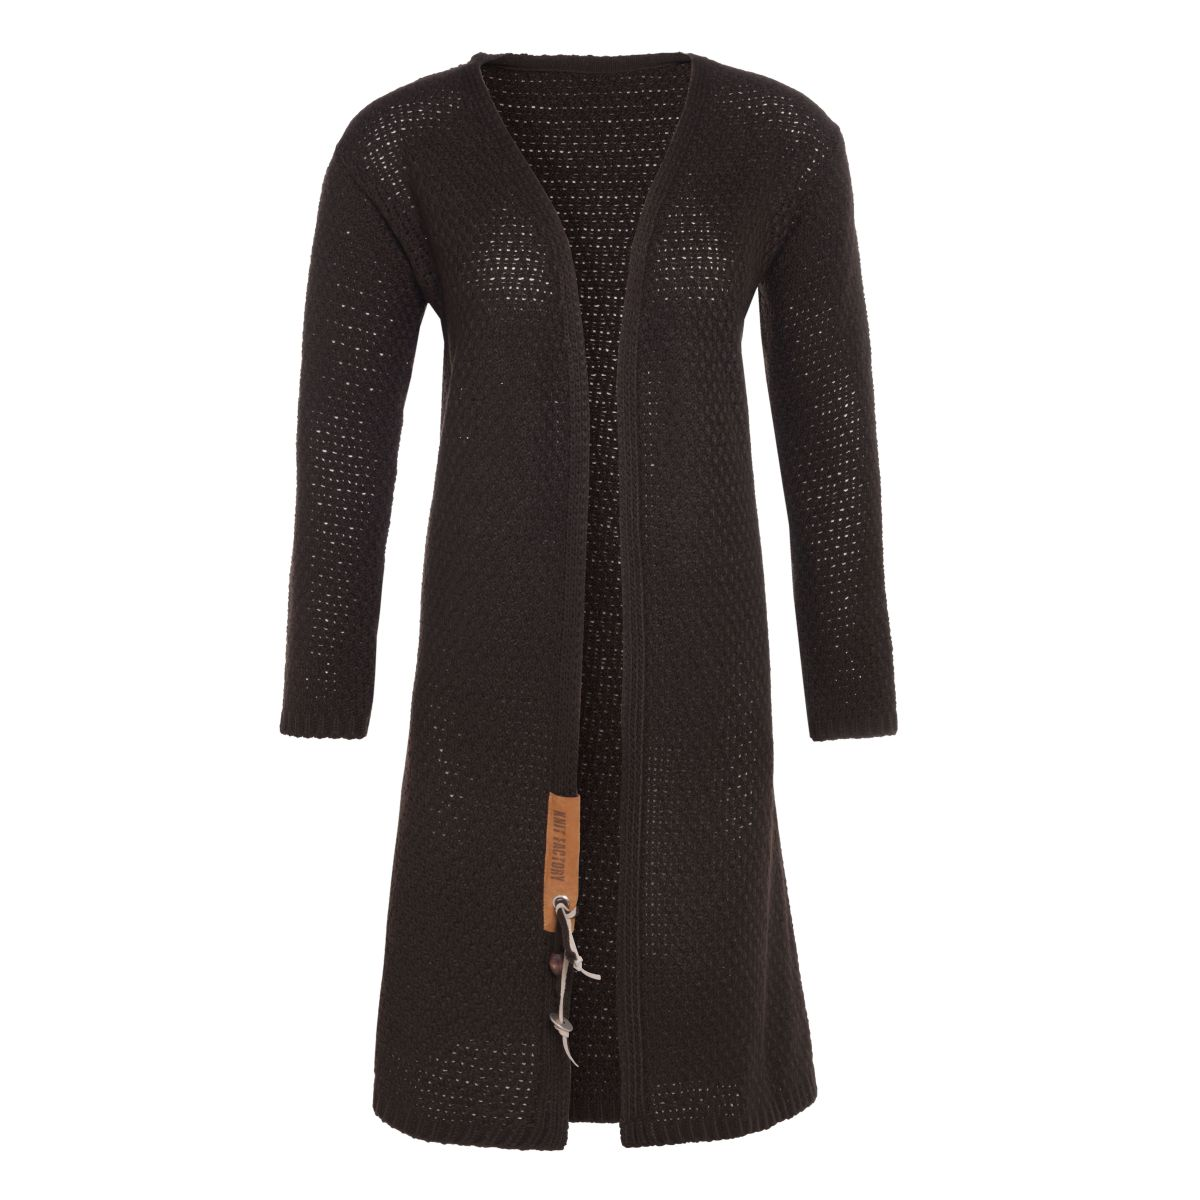 luna long knitted cardigan dark brown 4042